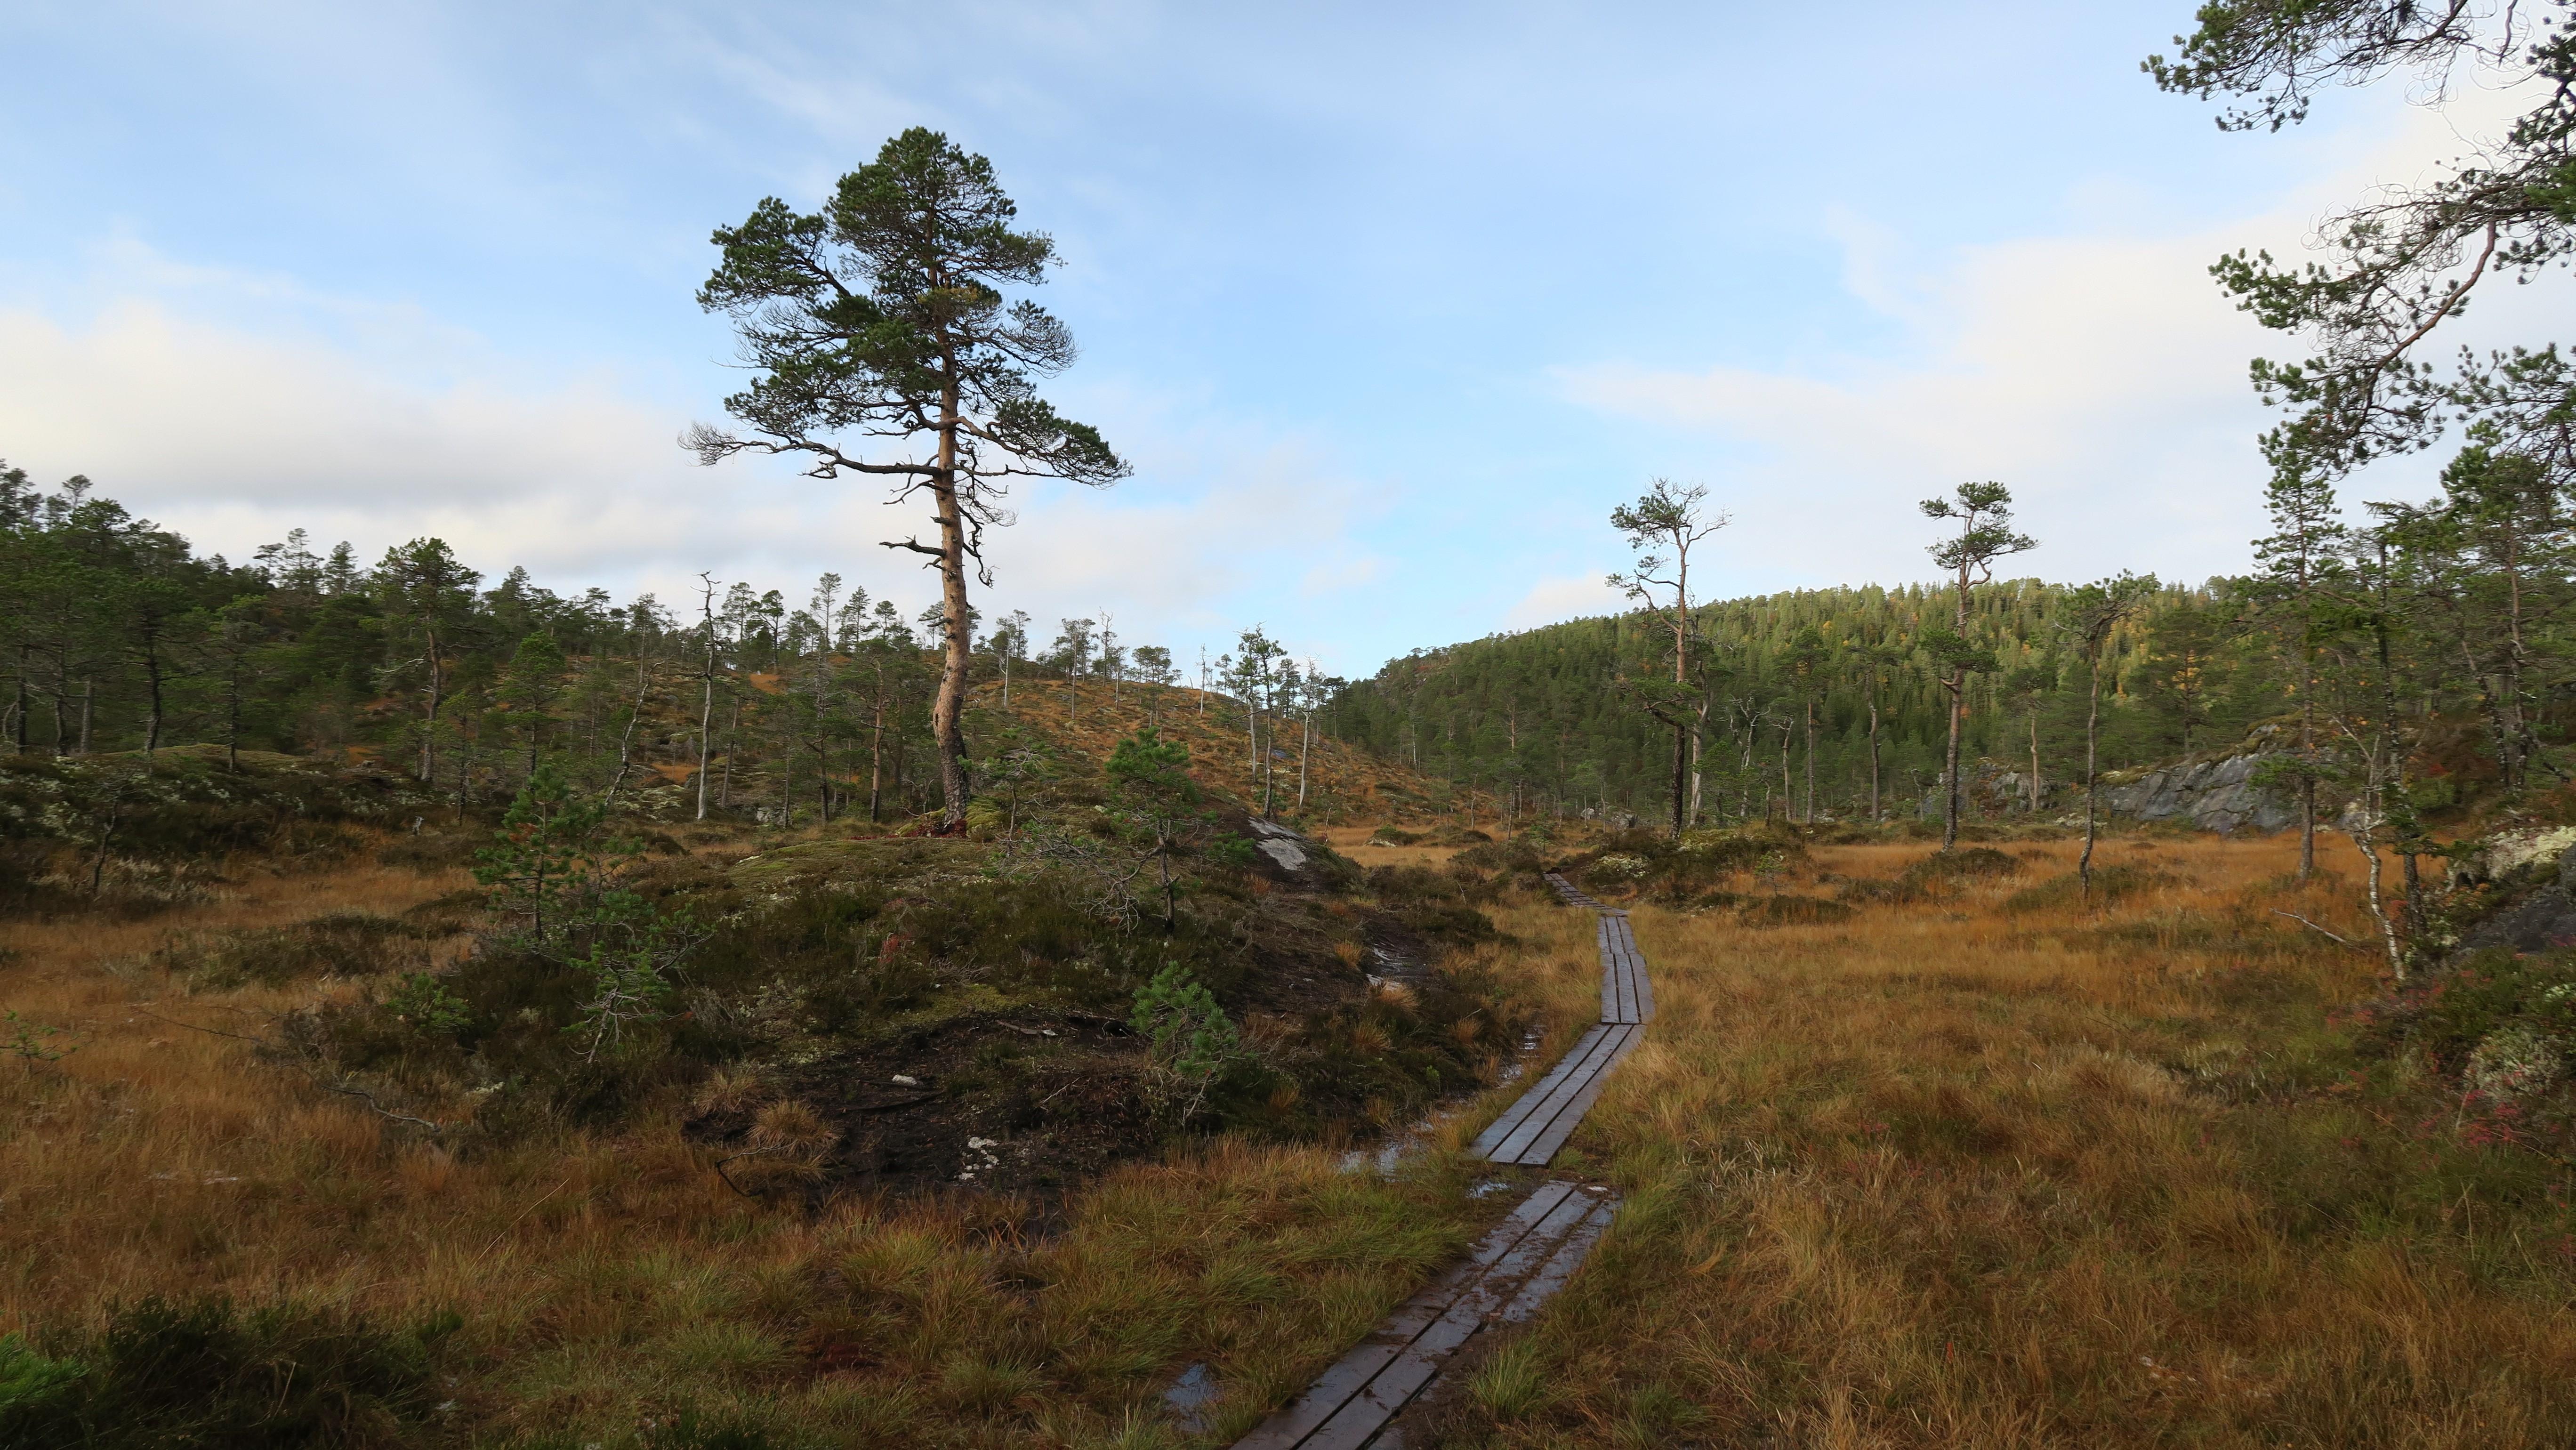 Klopper på tur til Spillumsaksla i Spillumsmarka, Namsos.